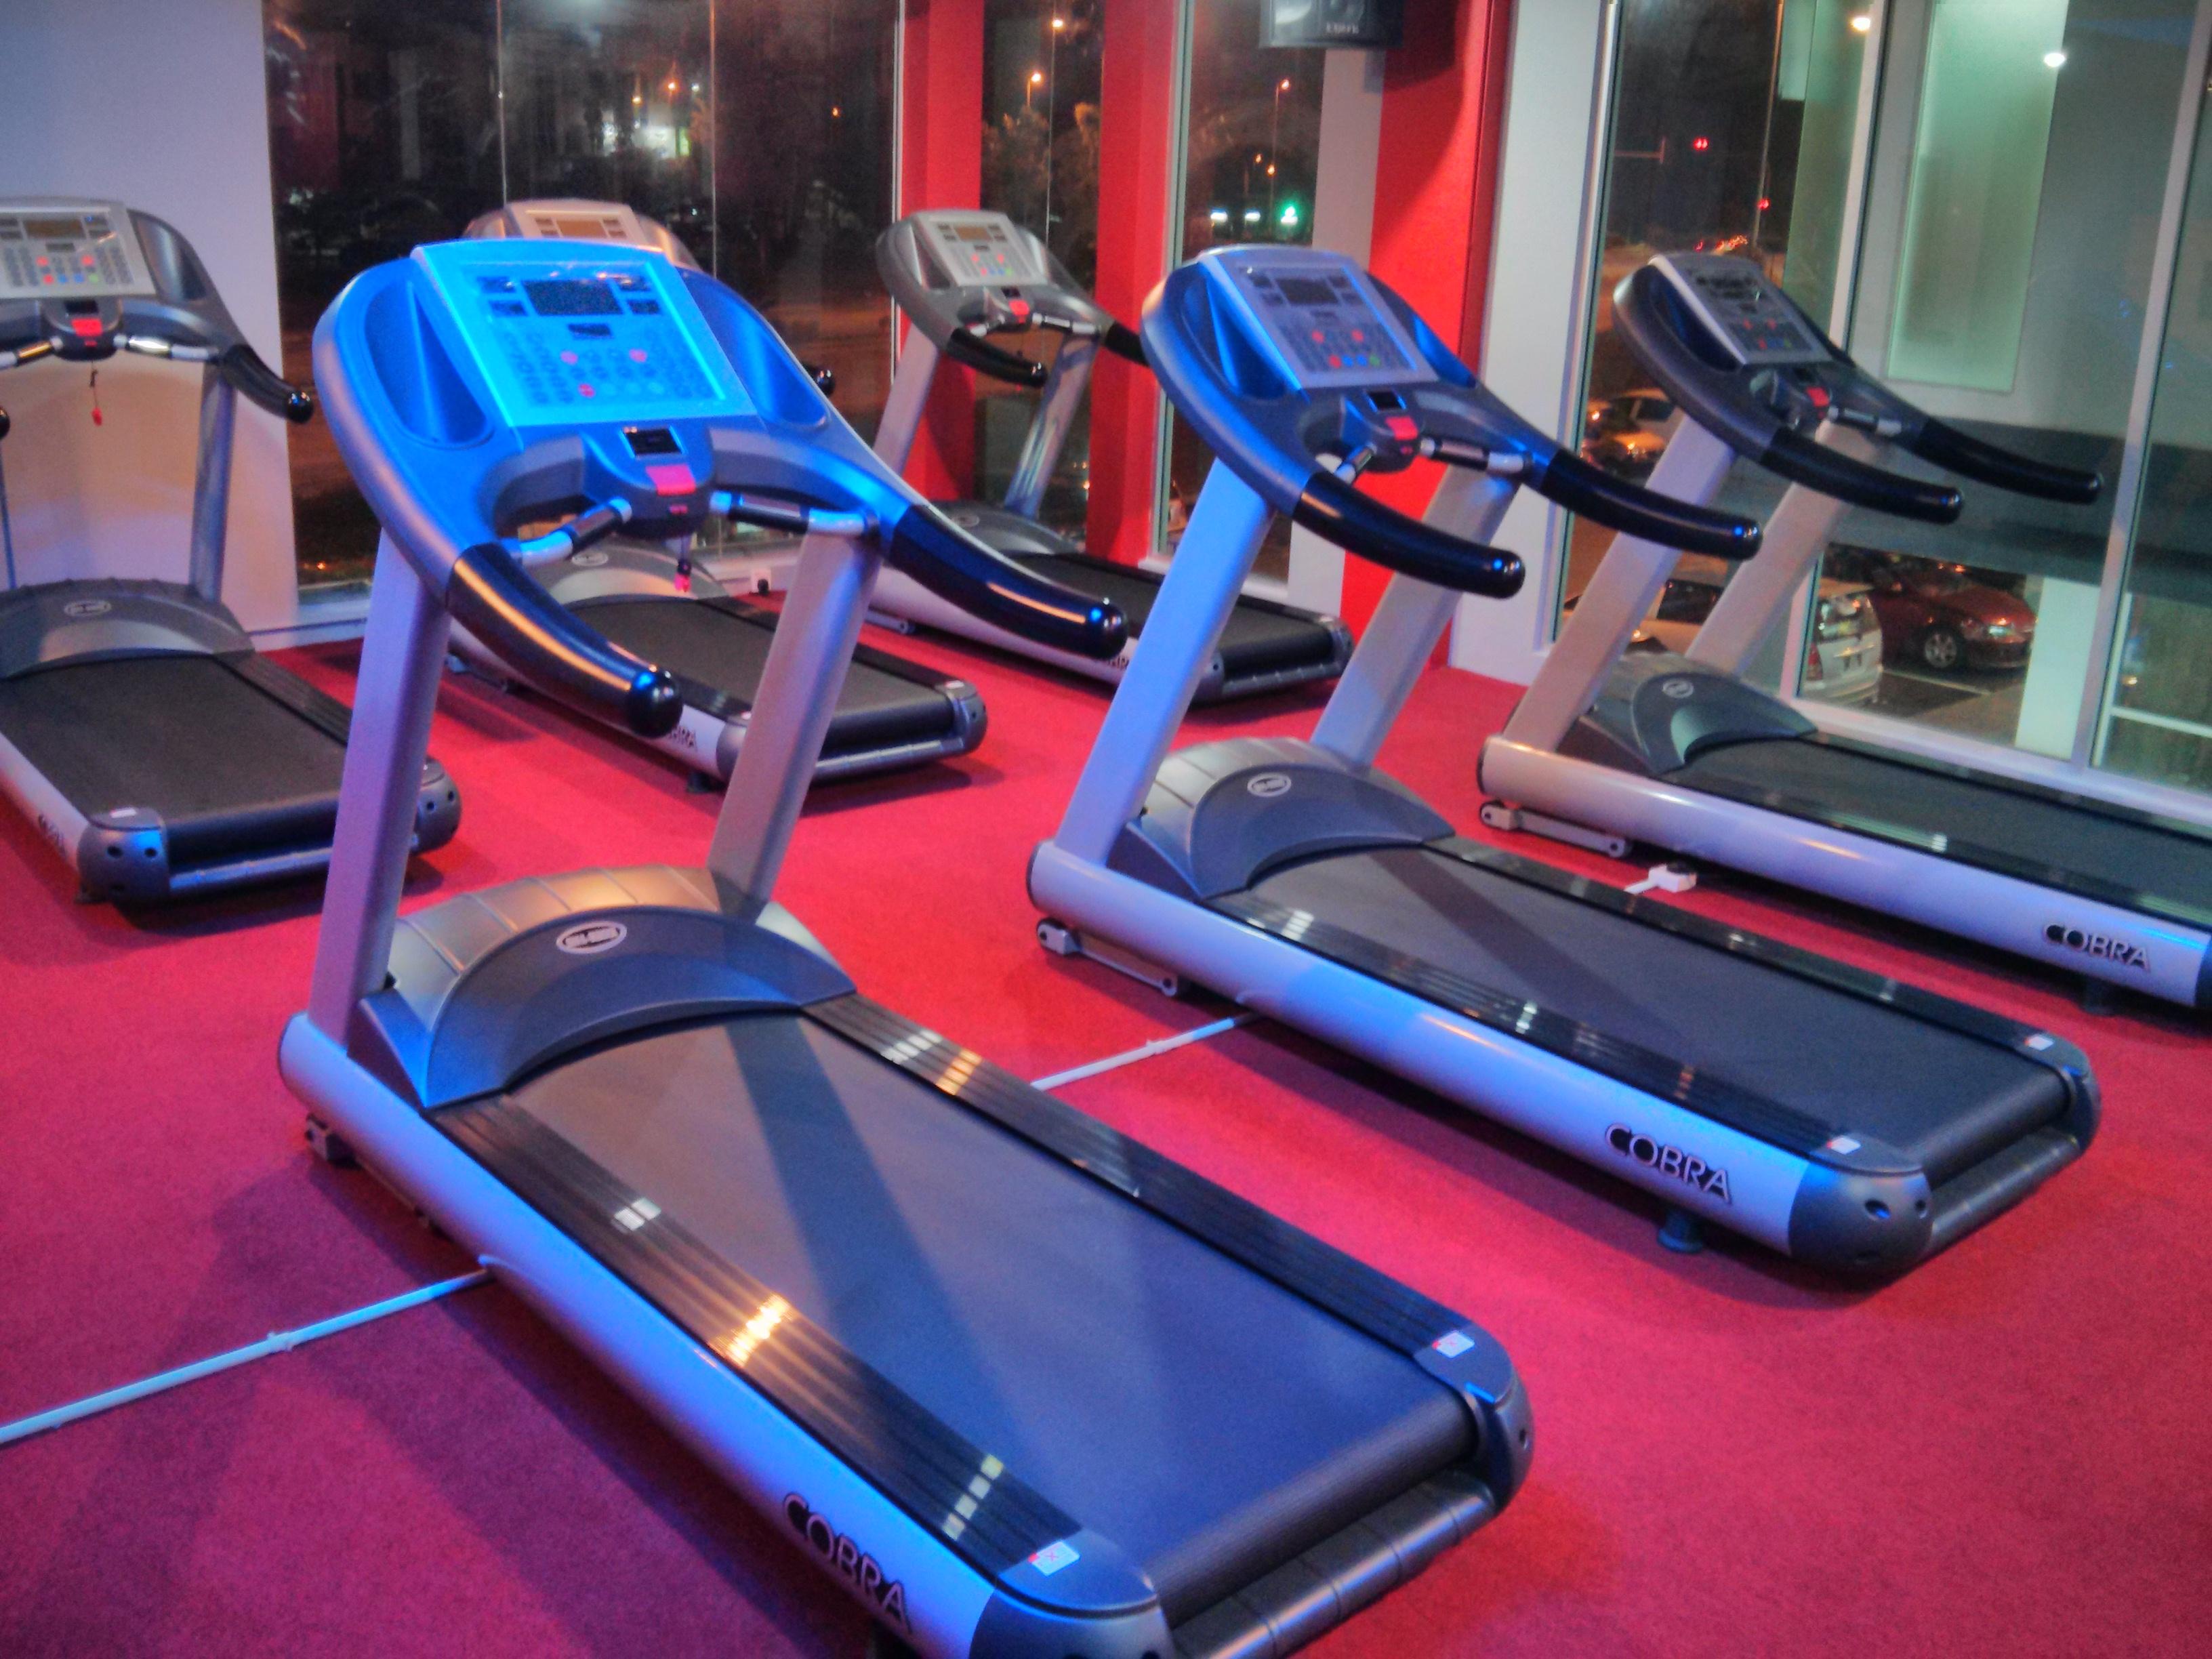 File:Treadmills in Cobra Gym 24 Hour Fitness.jpg - Wikimedia Commons